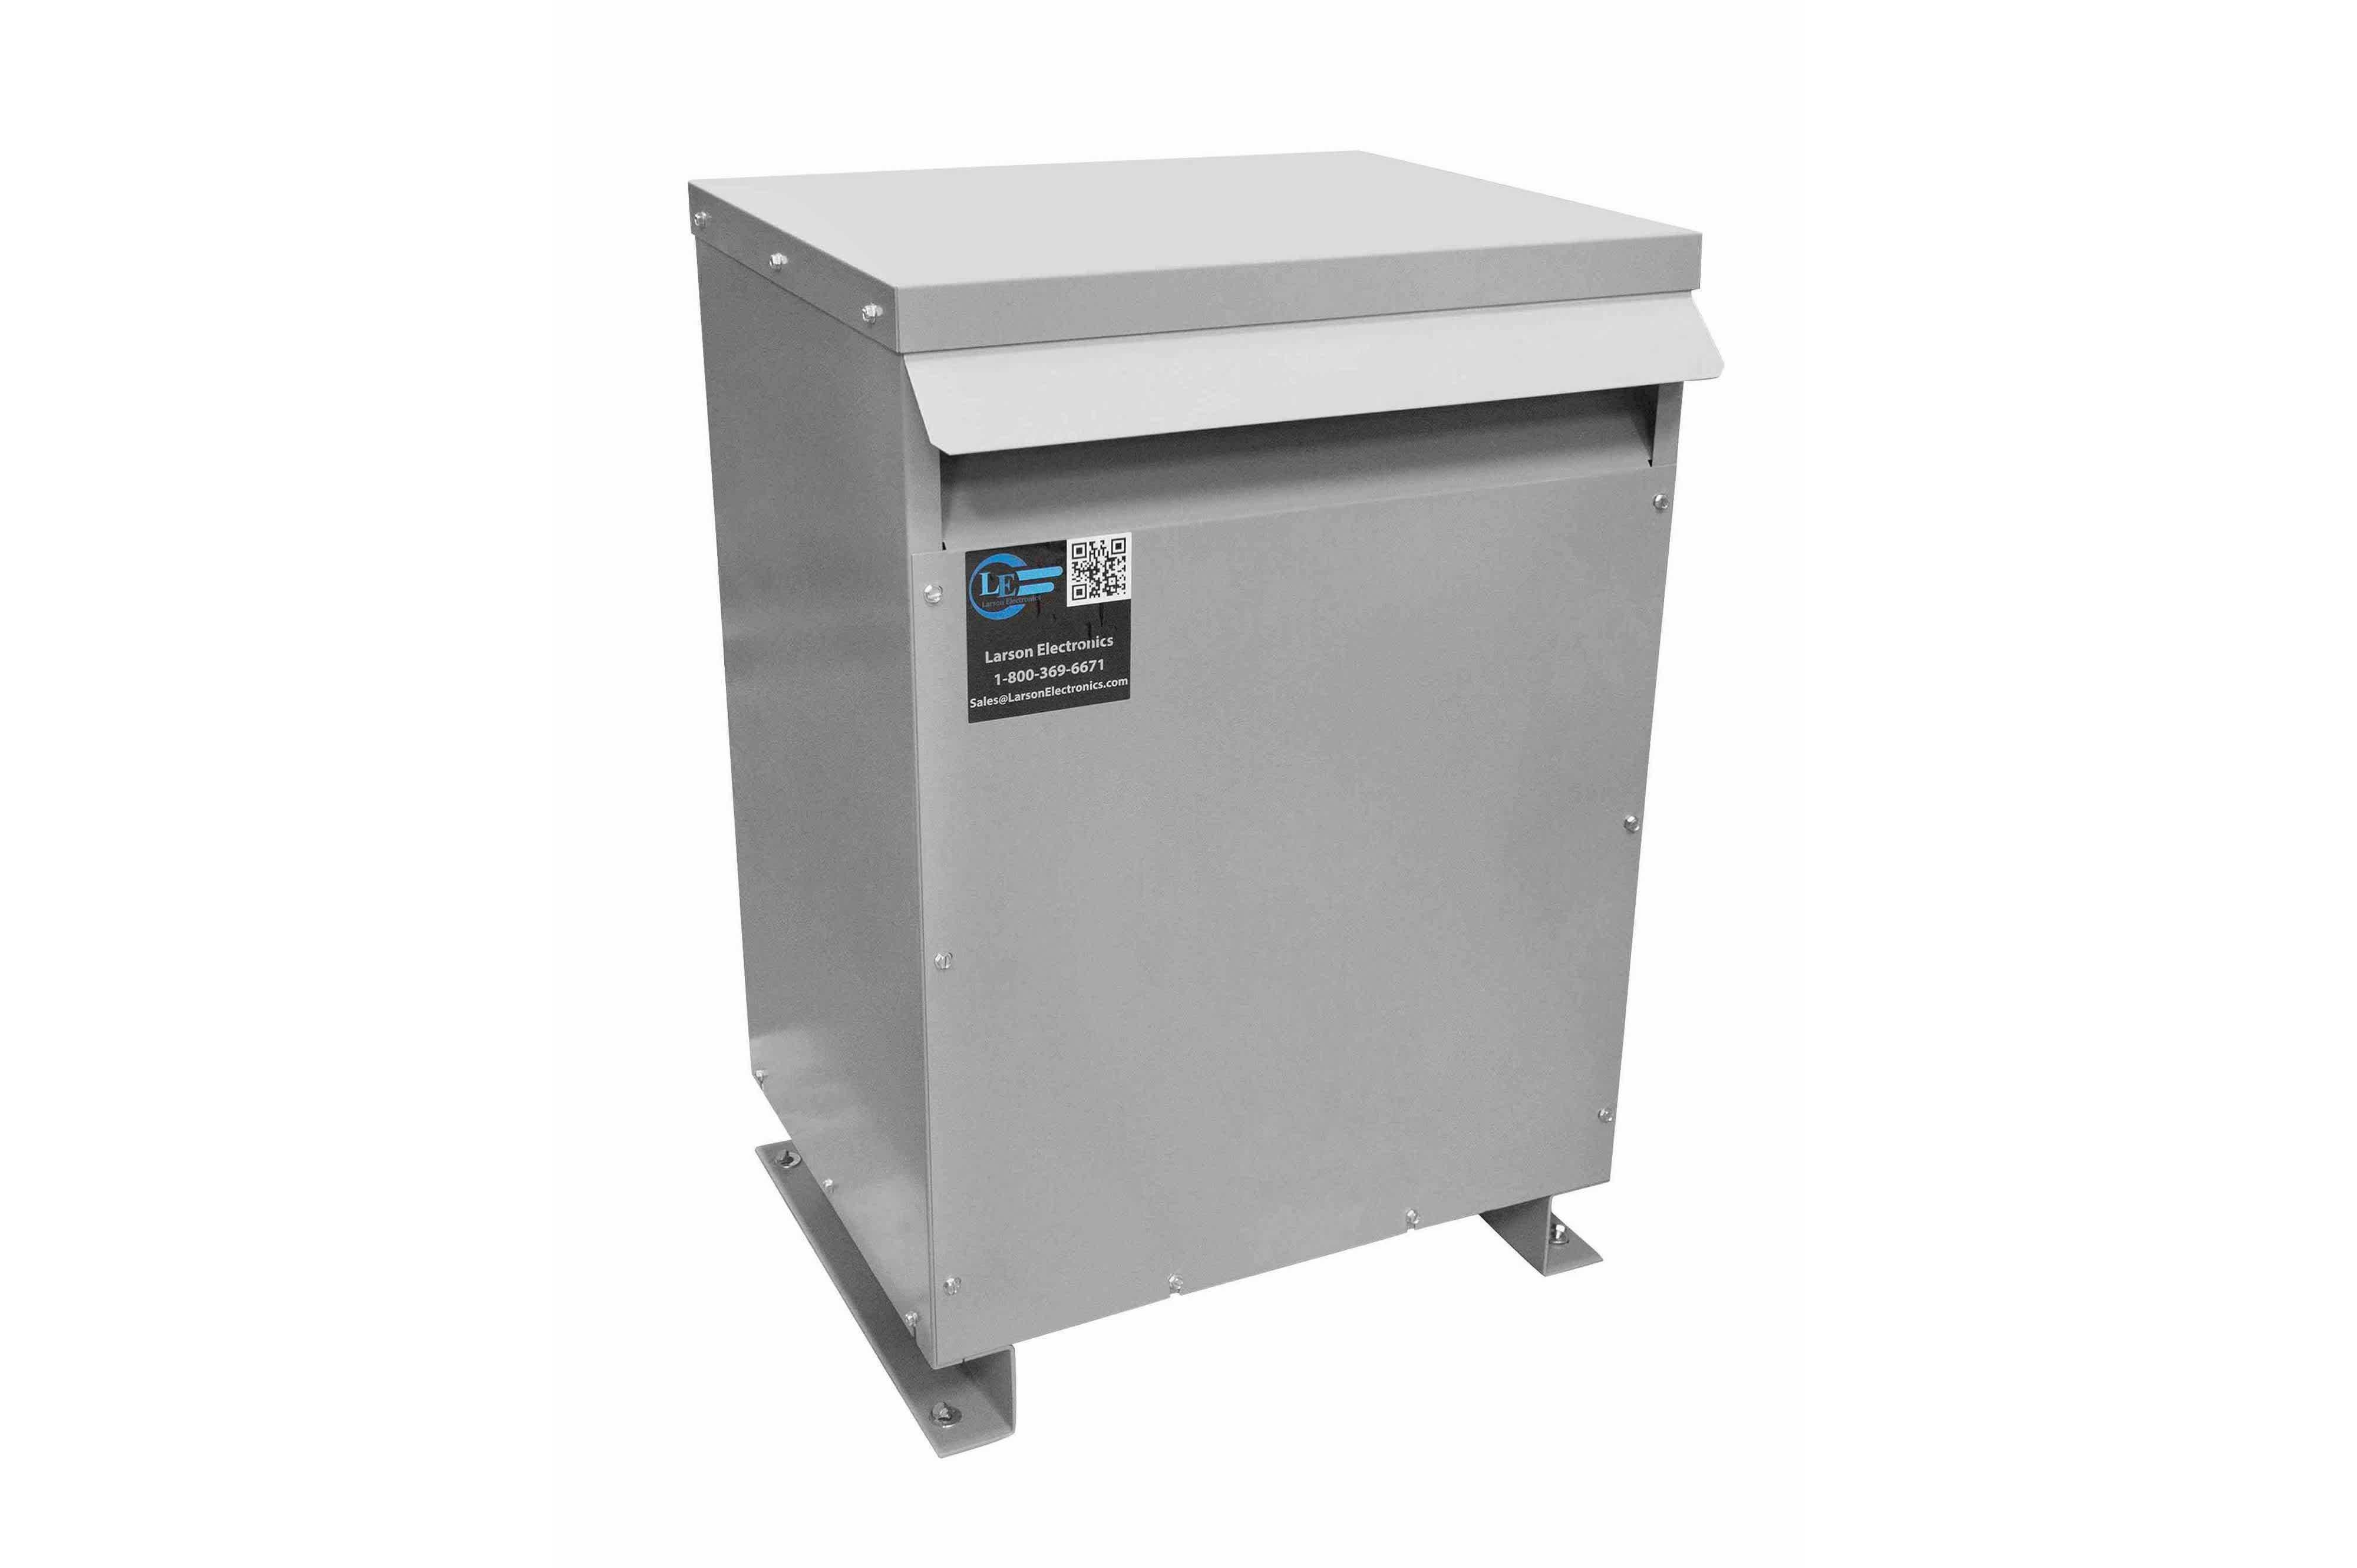 35 kVA 3PH Isolation Transformer, 480V Wye Primary, 415Y/240 Wye-N Secondary, N3R, Ventilated, 60 Hz